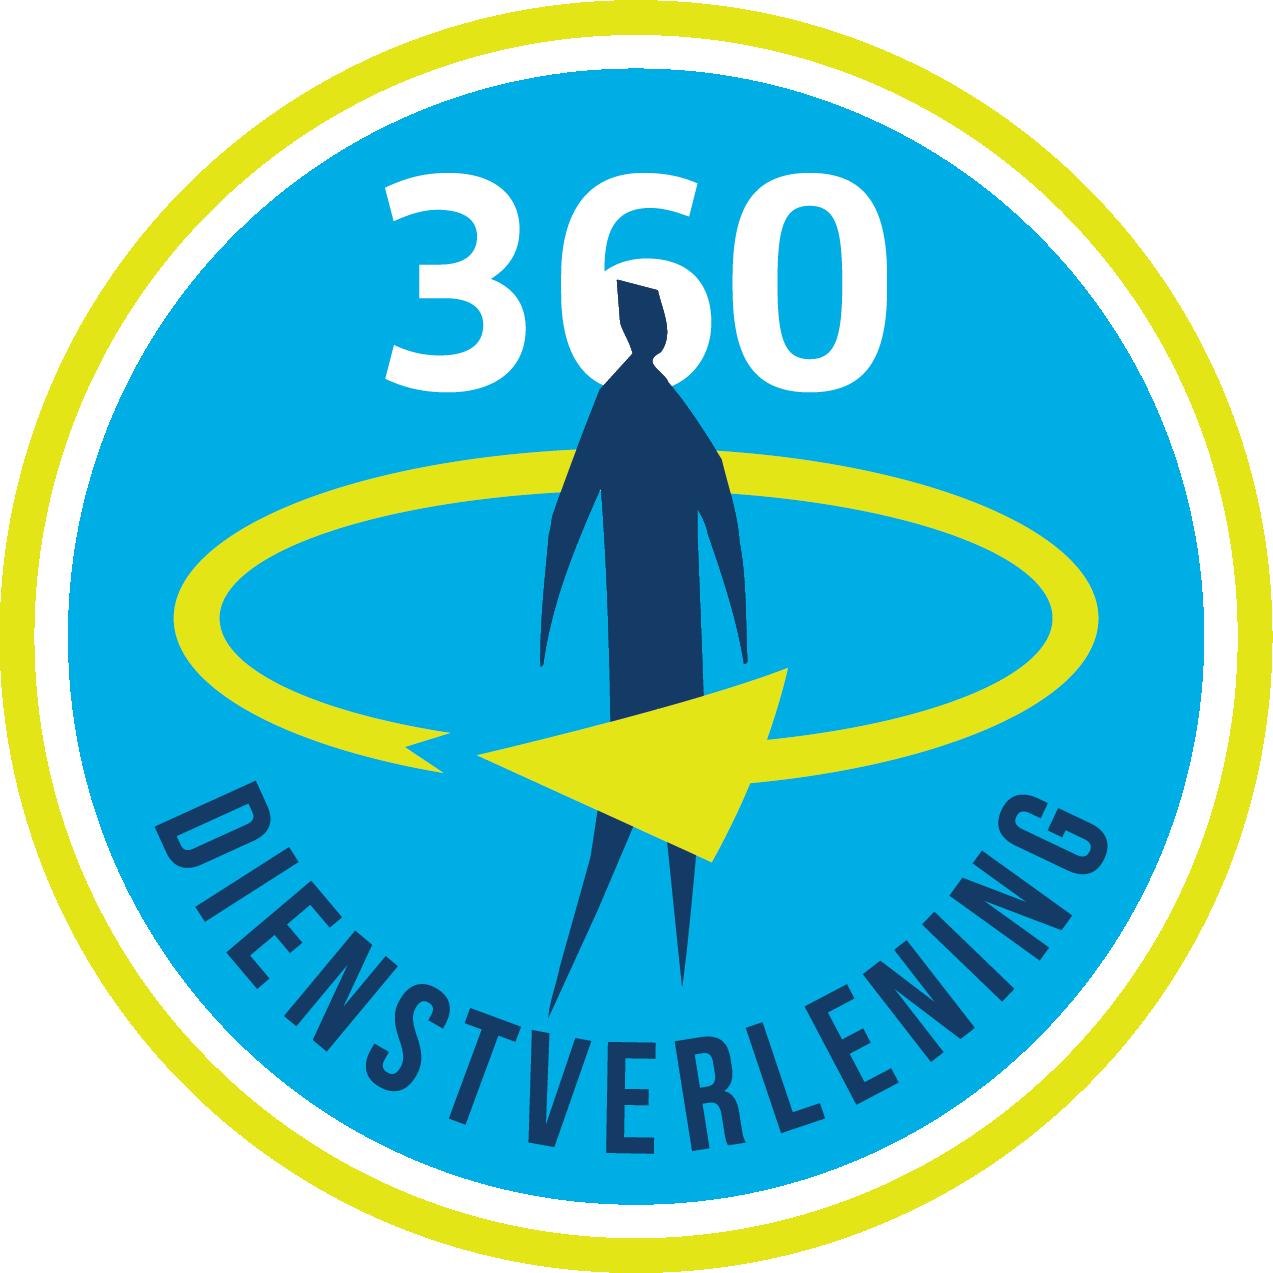 aclvb-universele_diensten-logo-cmyk_ok-2.png